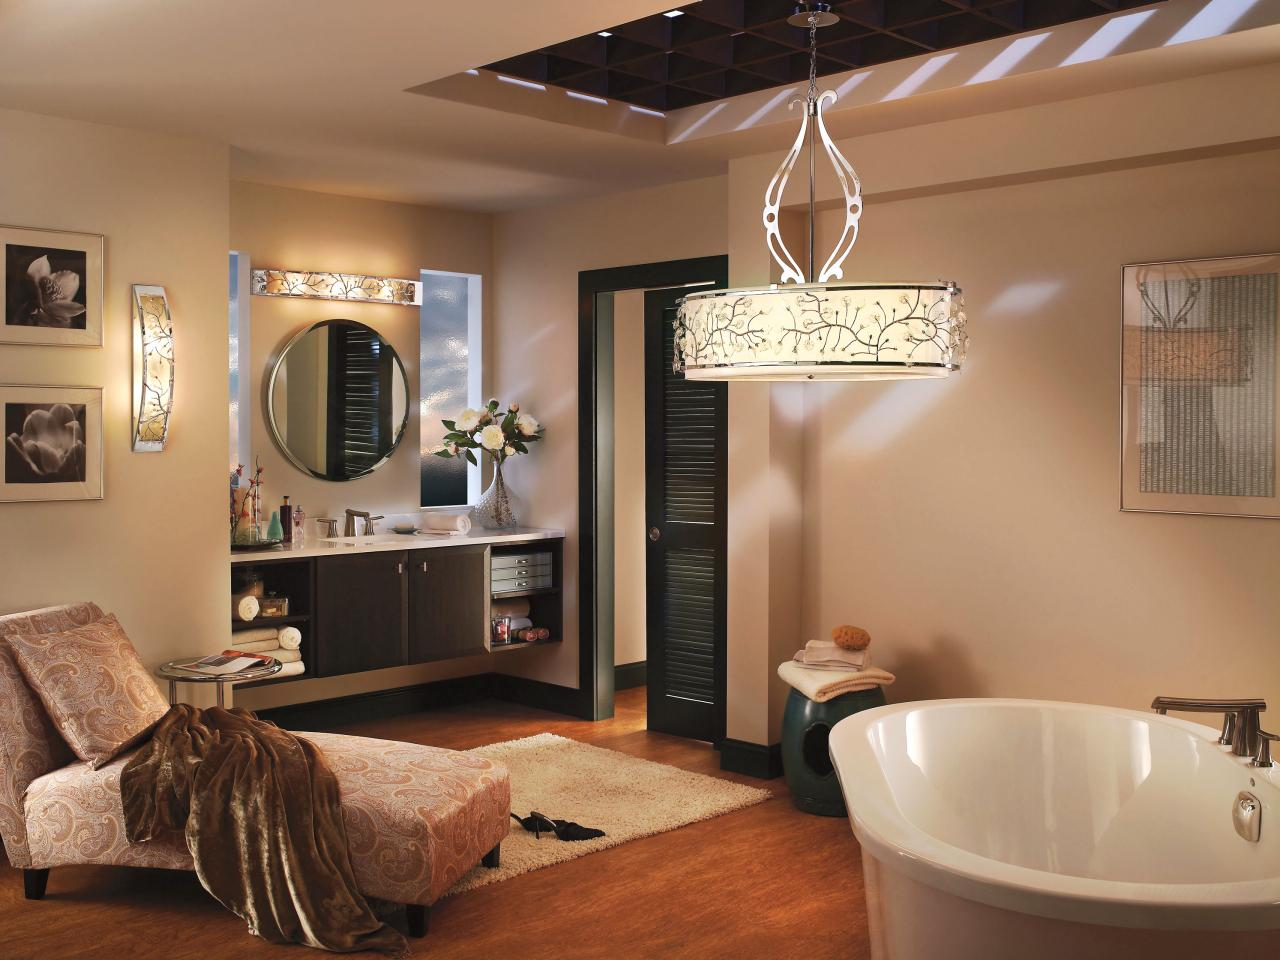 Smart Bathroom Lights 4